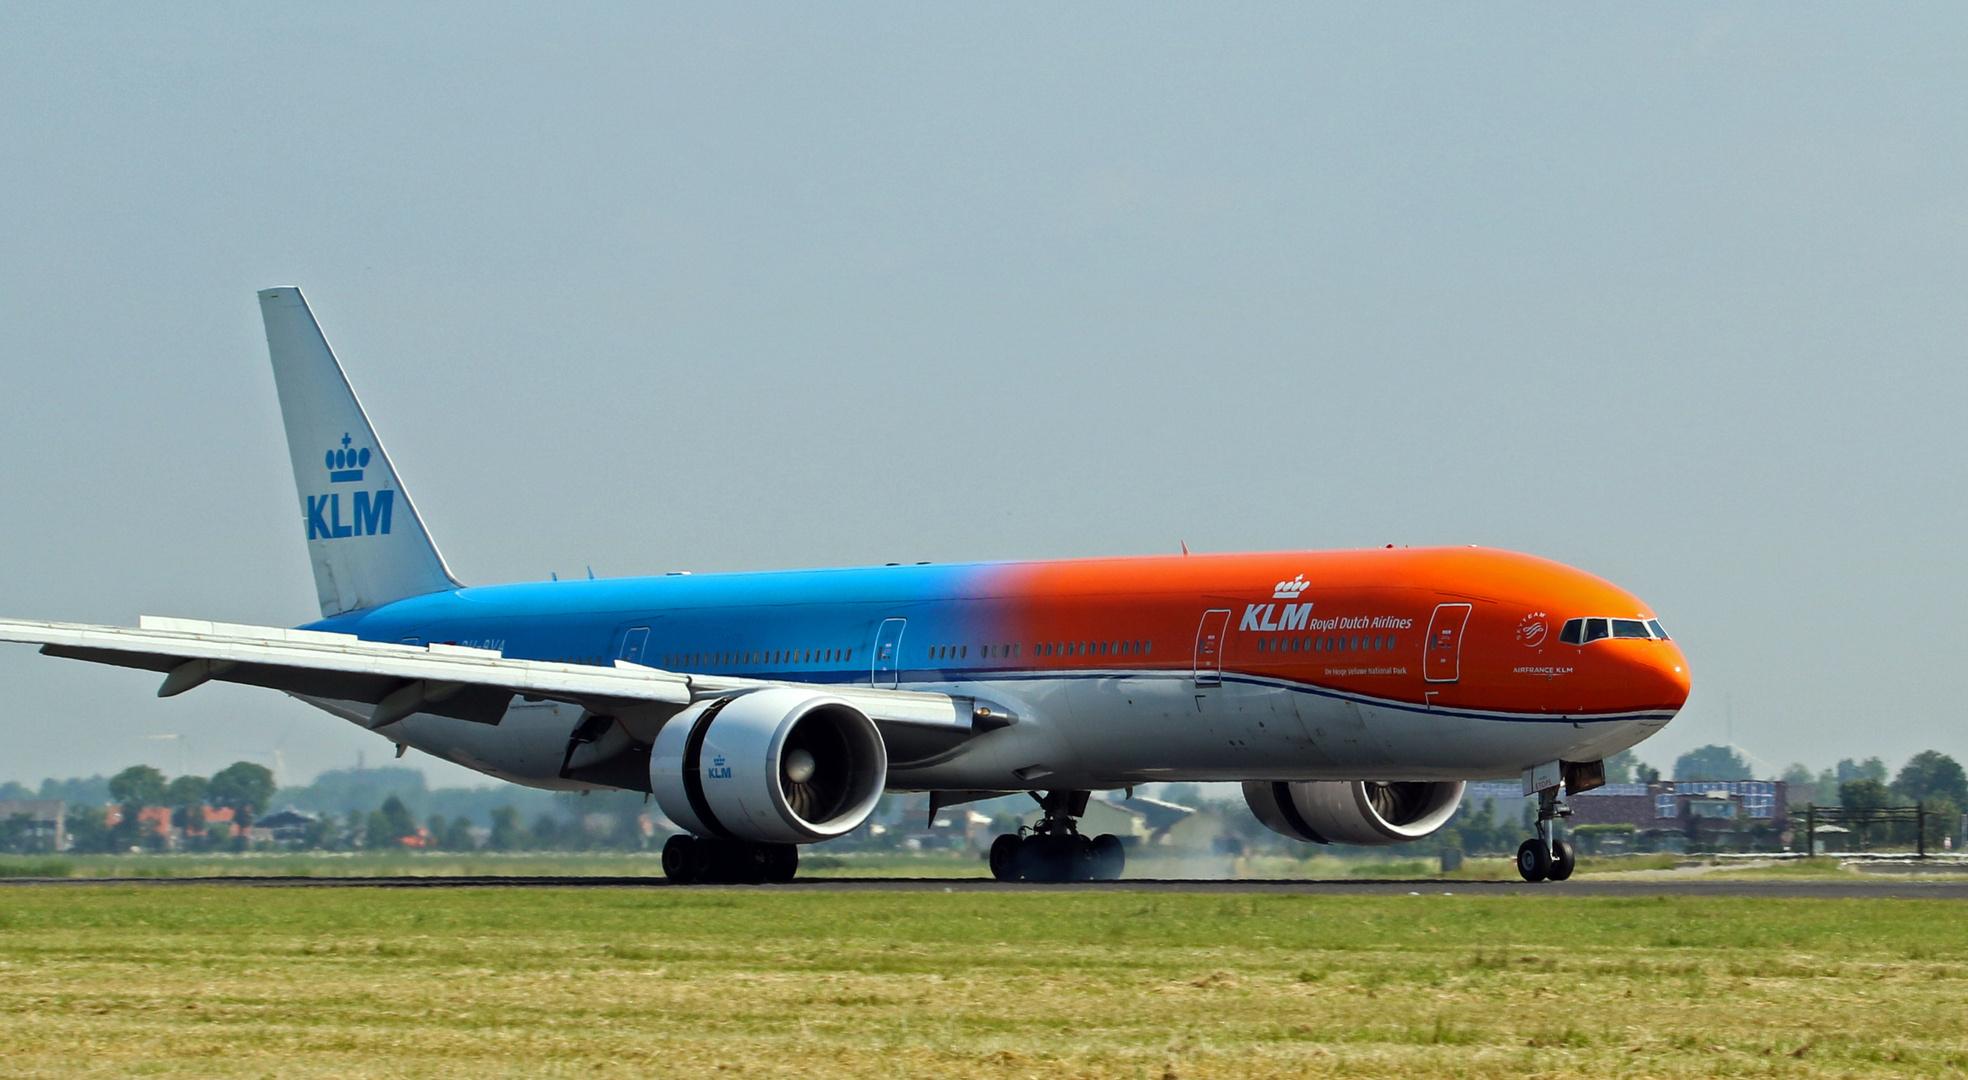 KLM / ORANGE PRIDE Livery